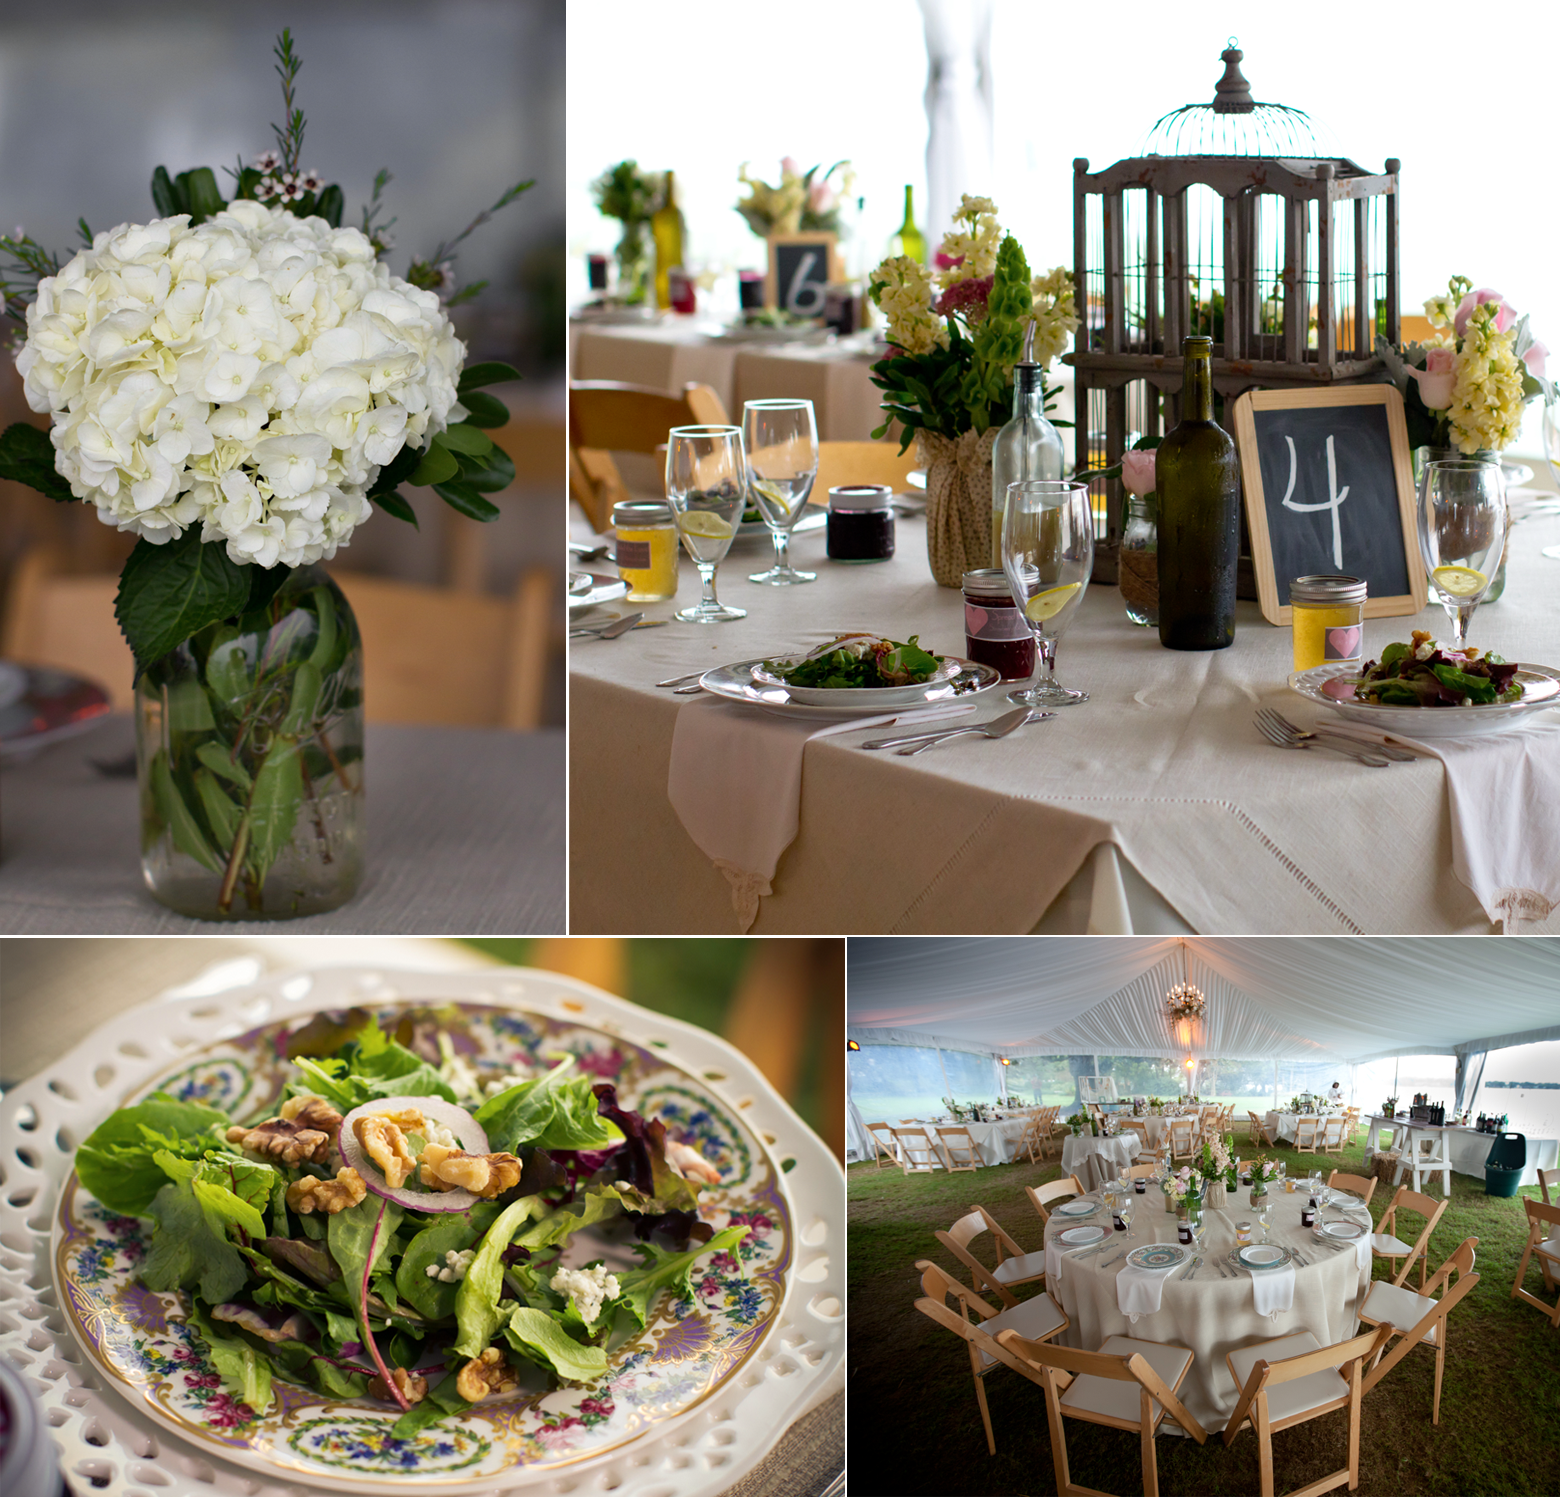 Mason Jar Wedding Reception Ideas: Elegant Outdoor Wedding Catering Tablescapes And Mason Jar